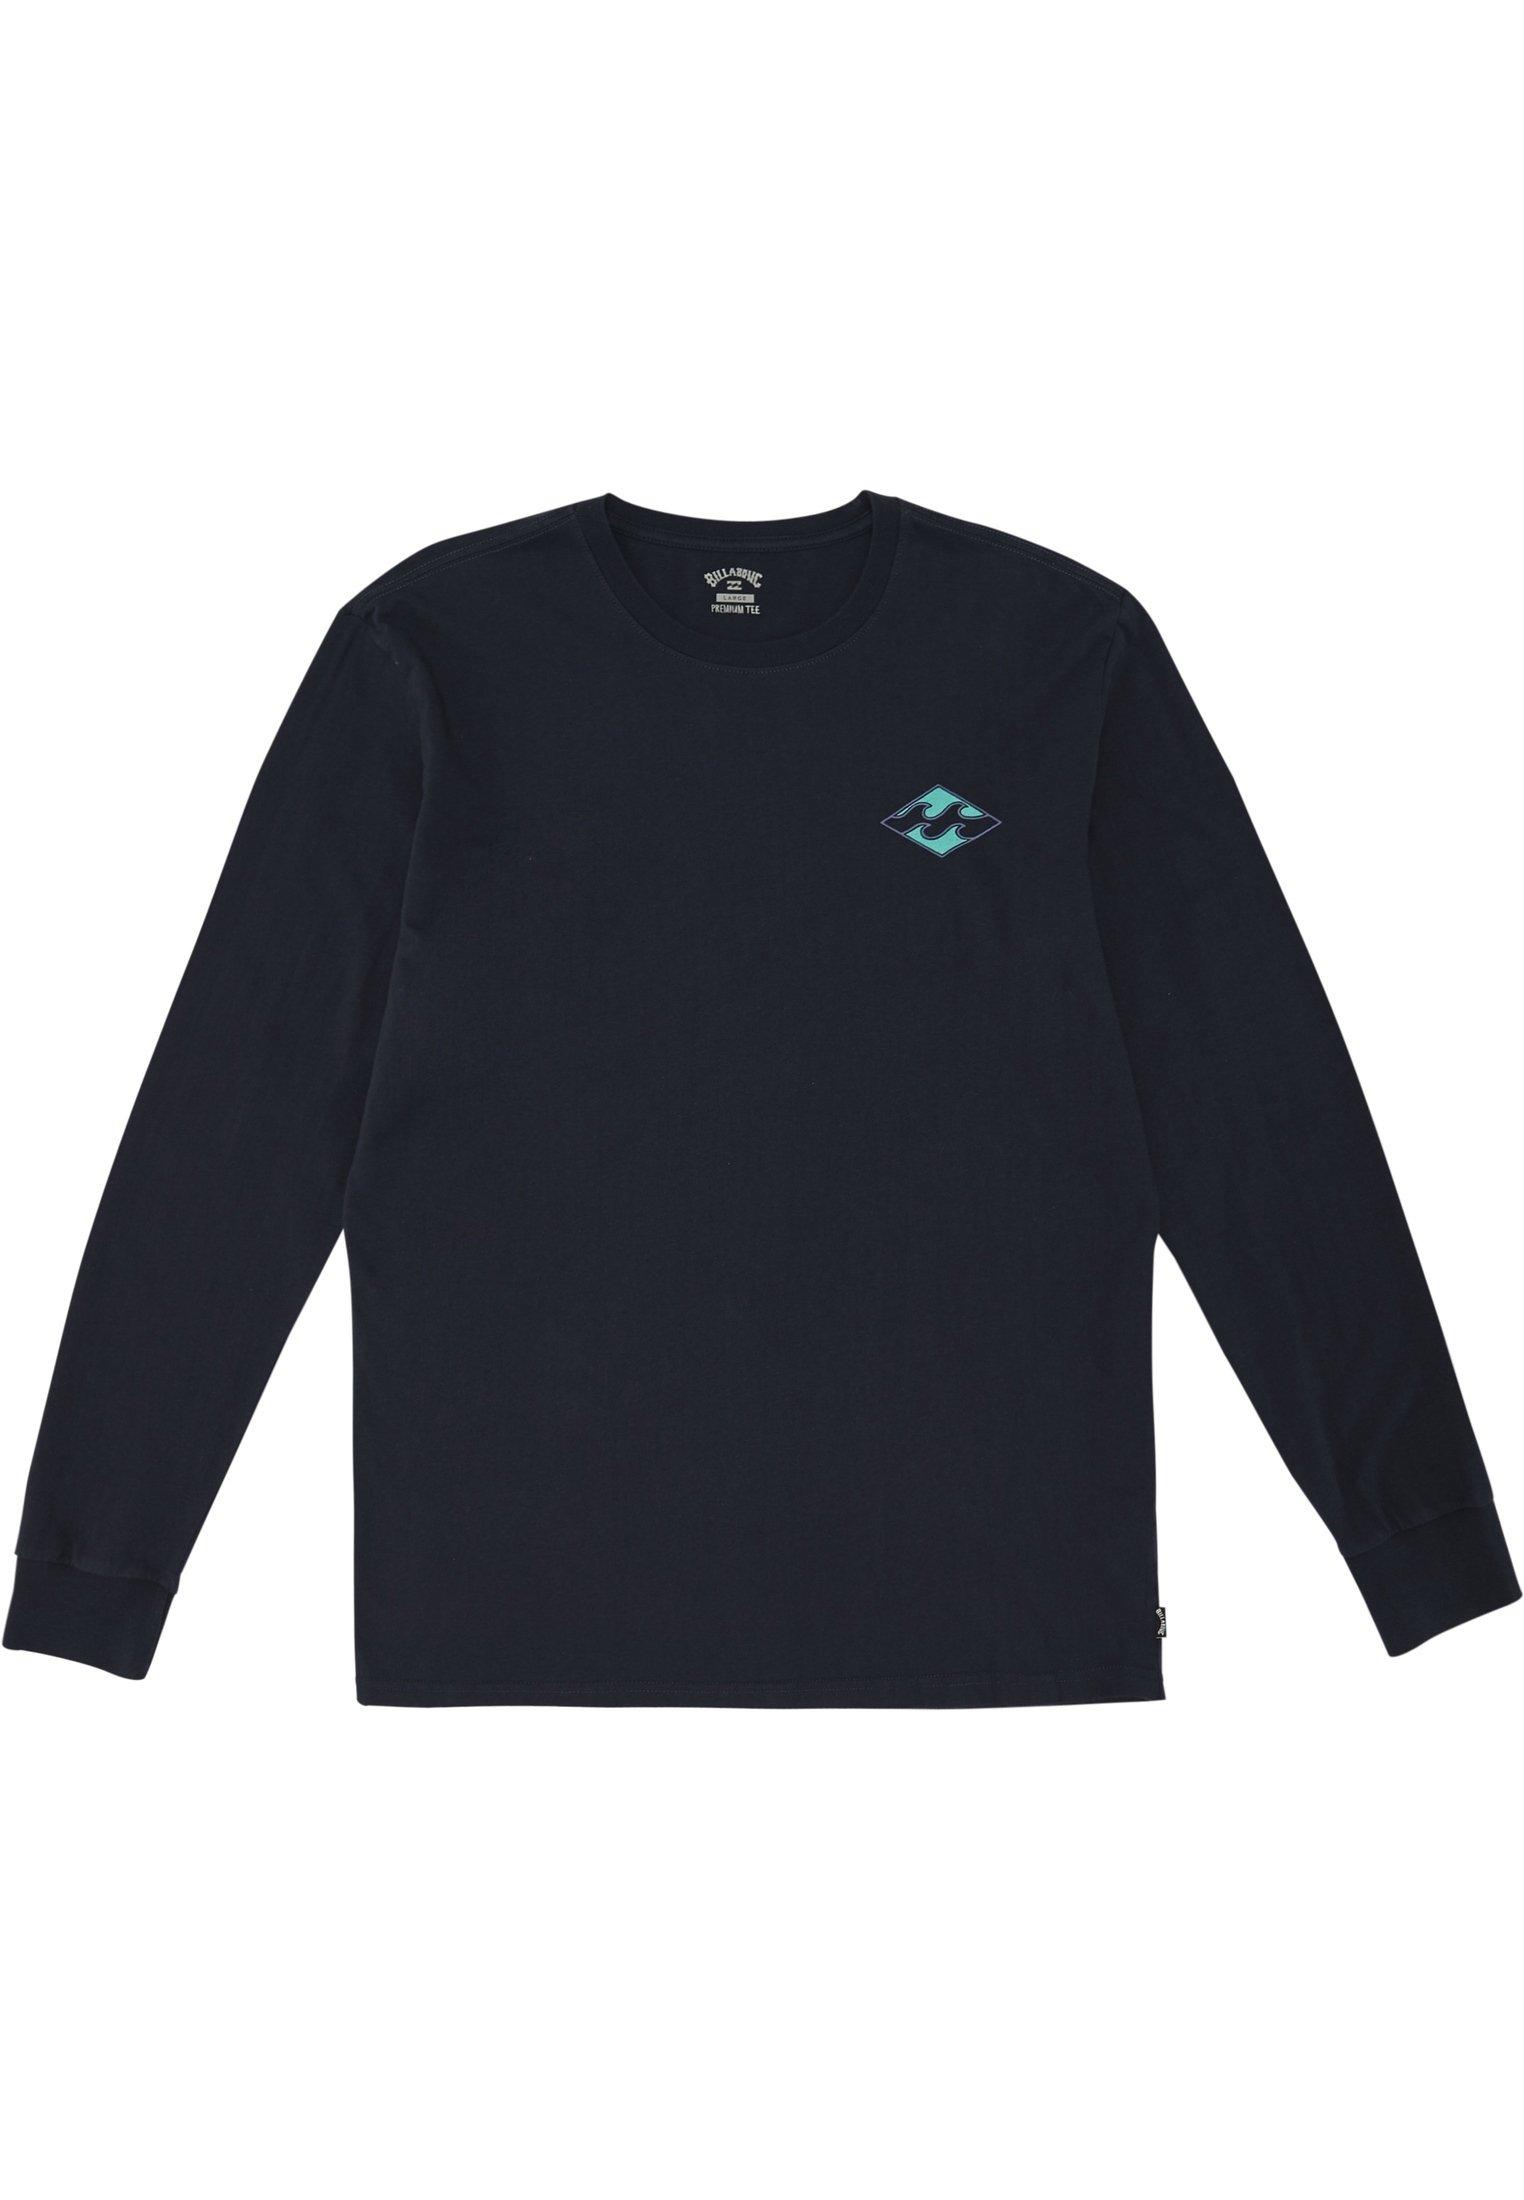 Uomo WARCHILD TEE - Maglietta a manica lunga